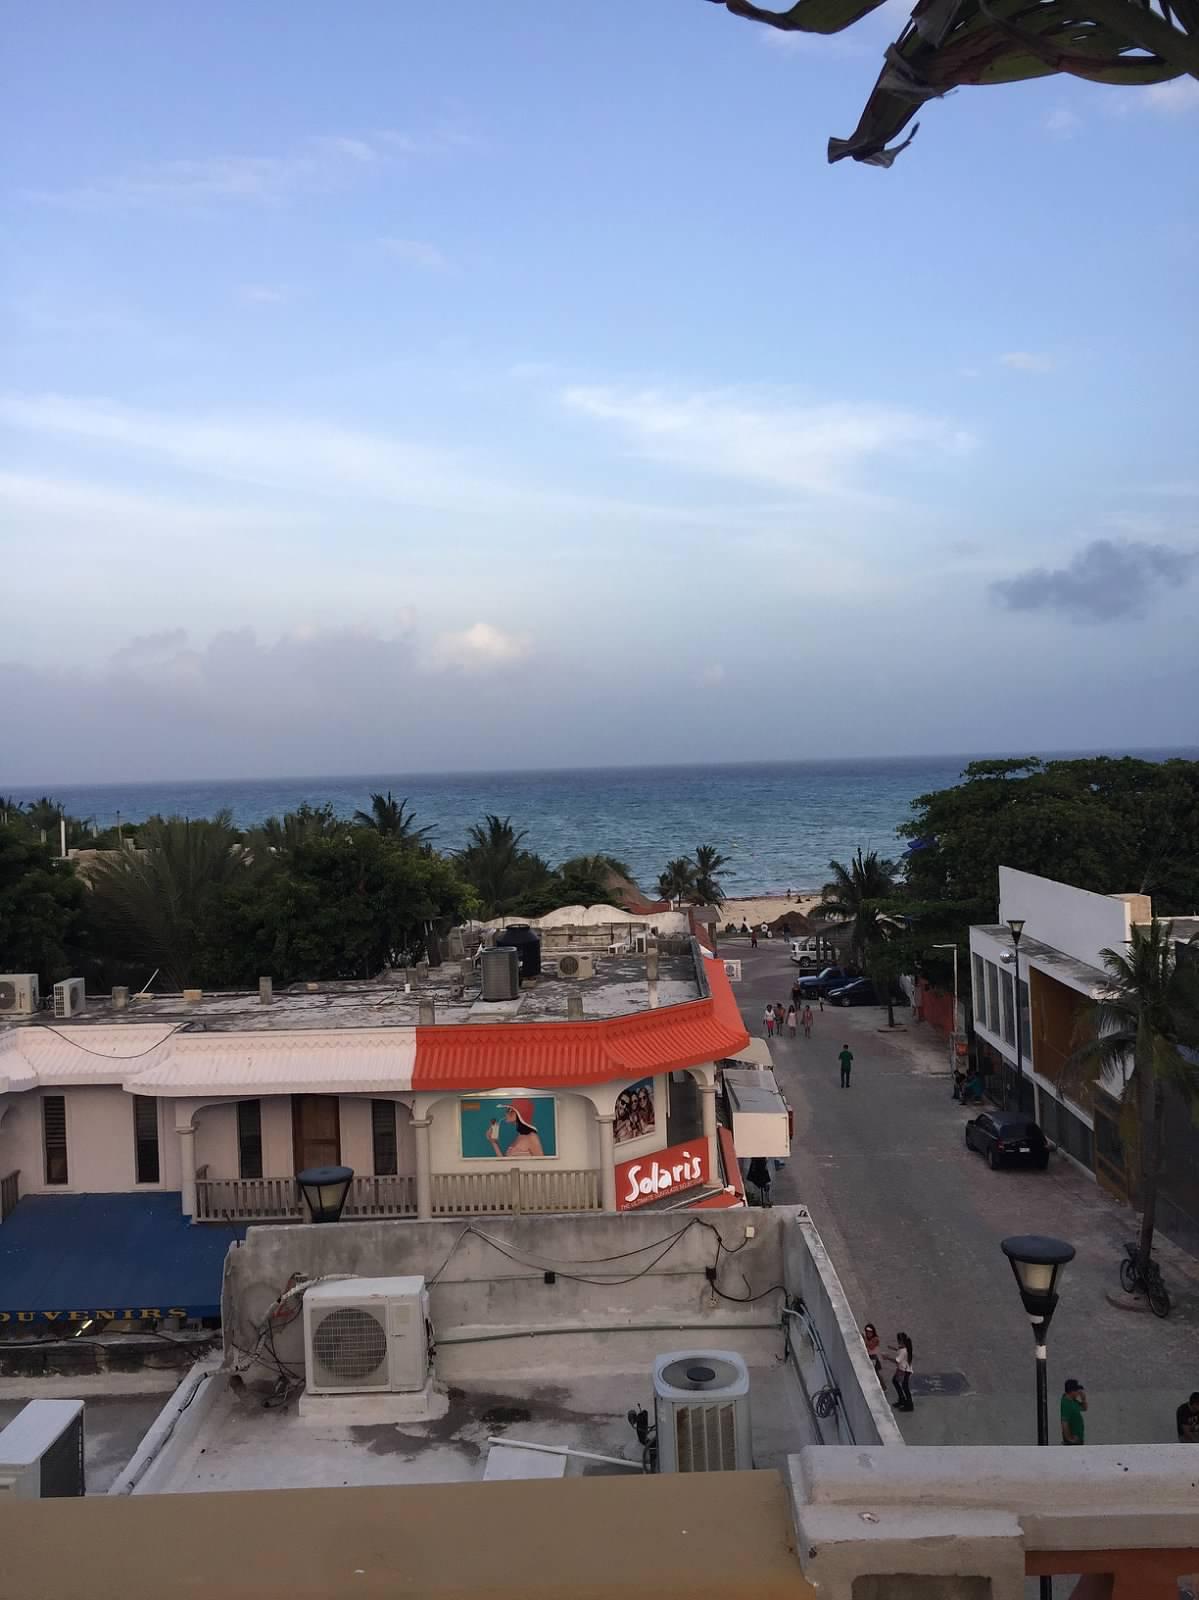 Black Destination Bride - BlackDesti Wedding Countdown Journal - Bridefriends Podcast - 1 Playa del Carmen Mexico - Carboncitos Rooftop Dinner2.jpeg